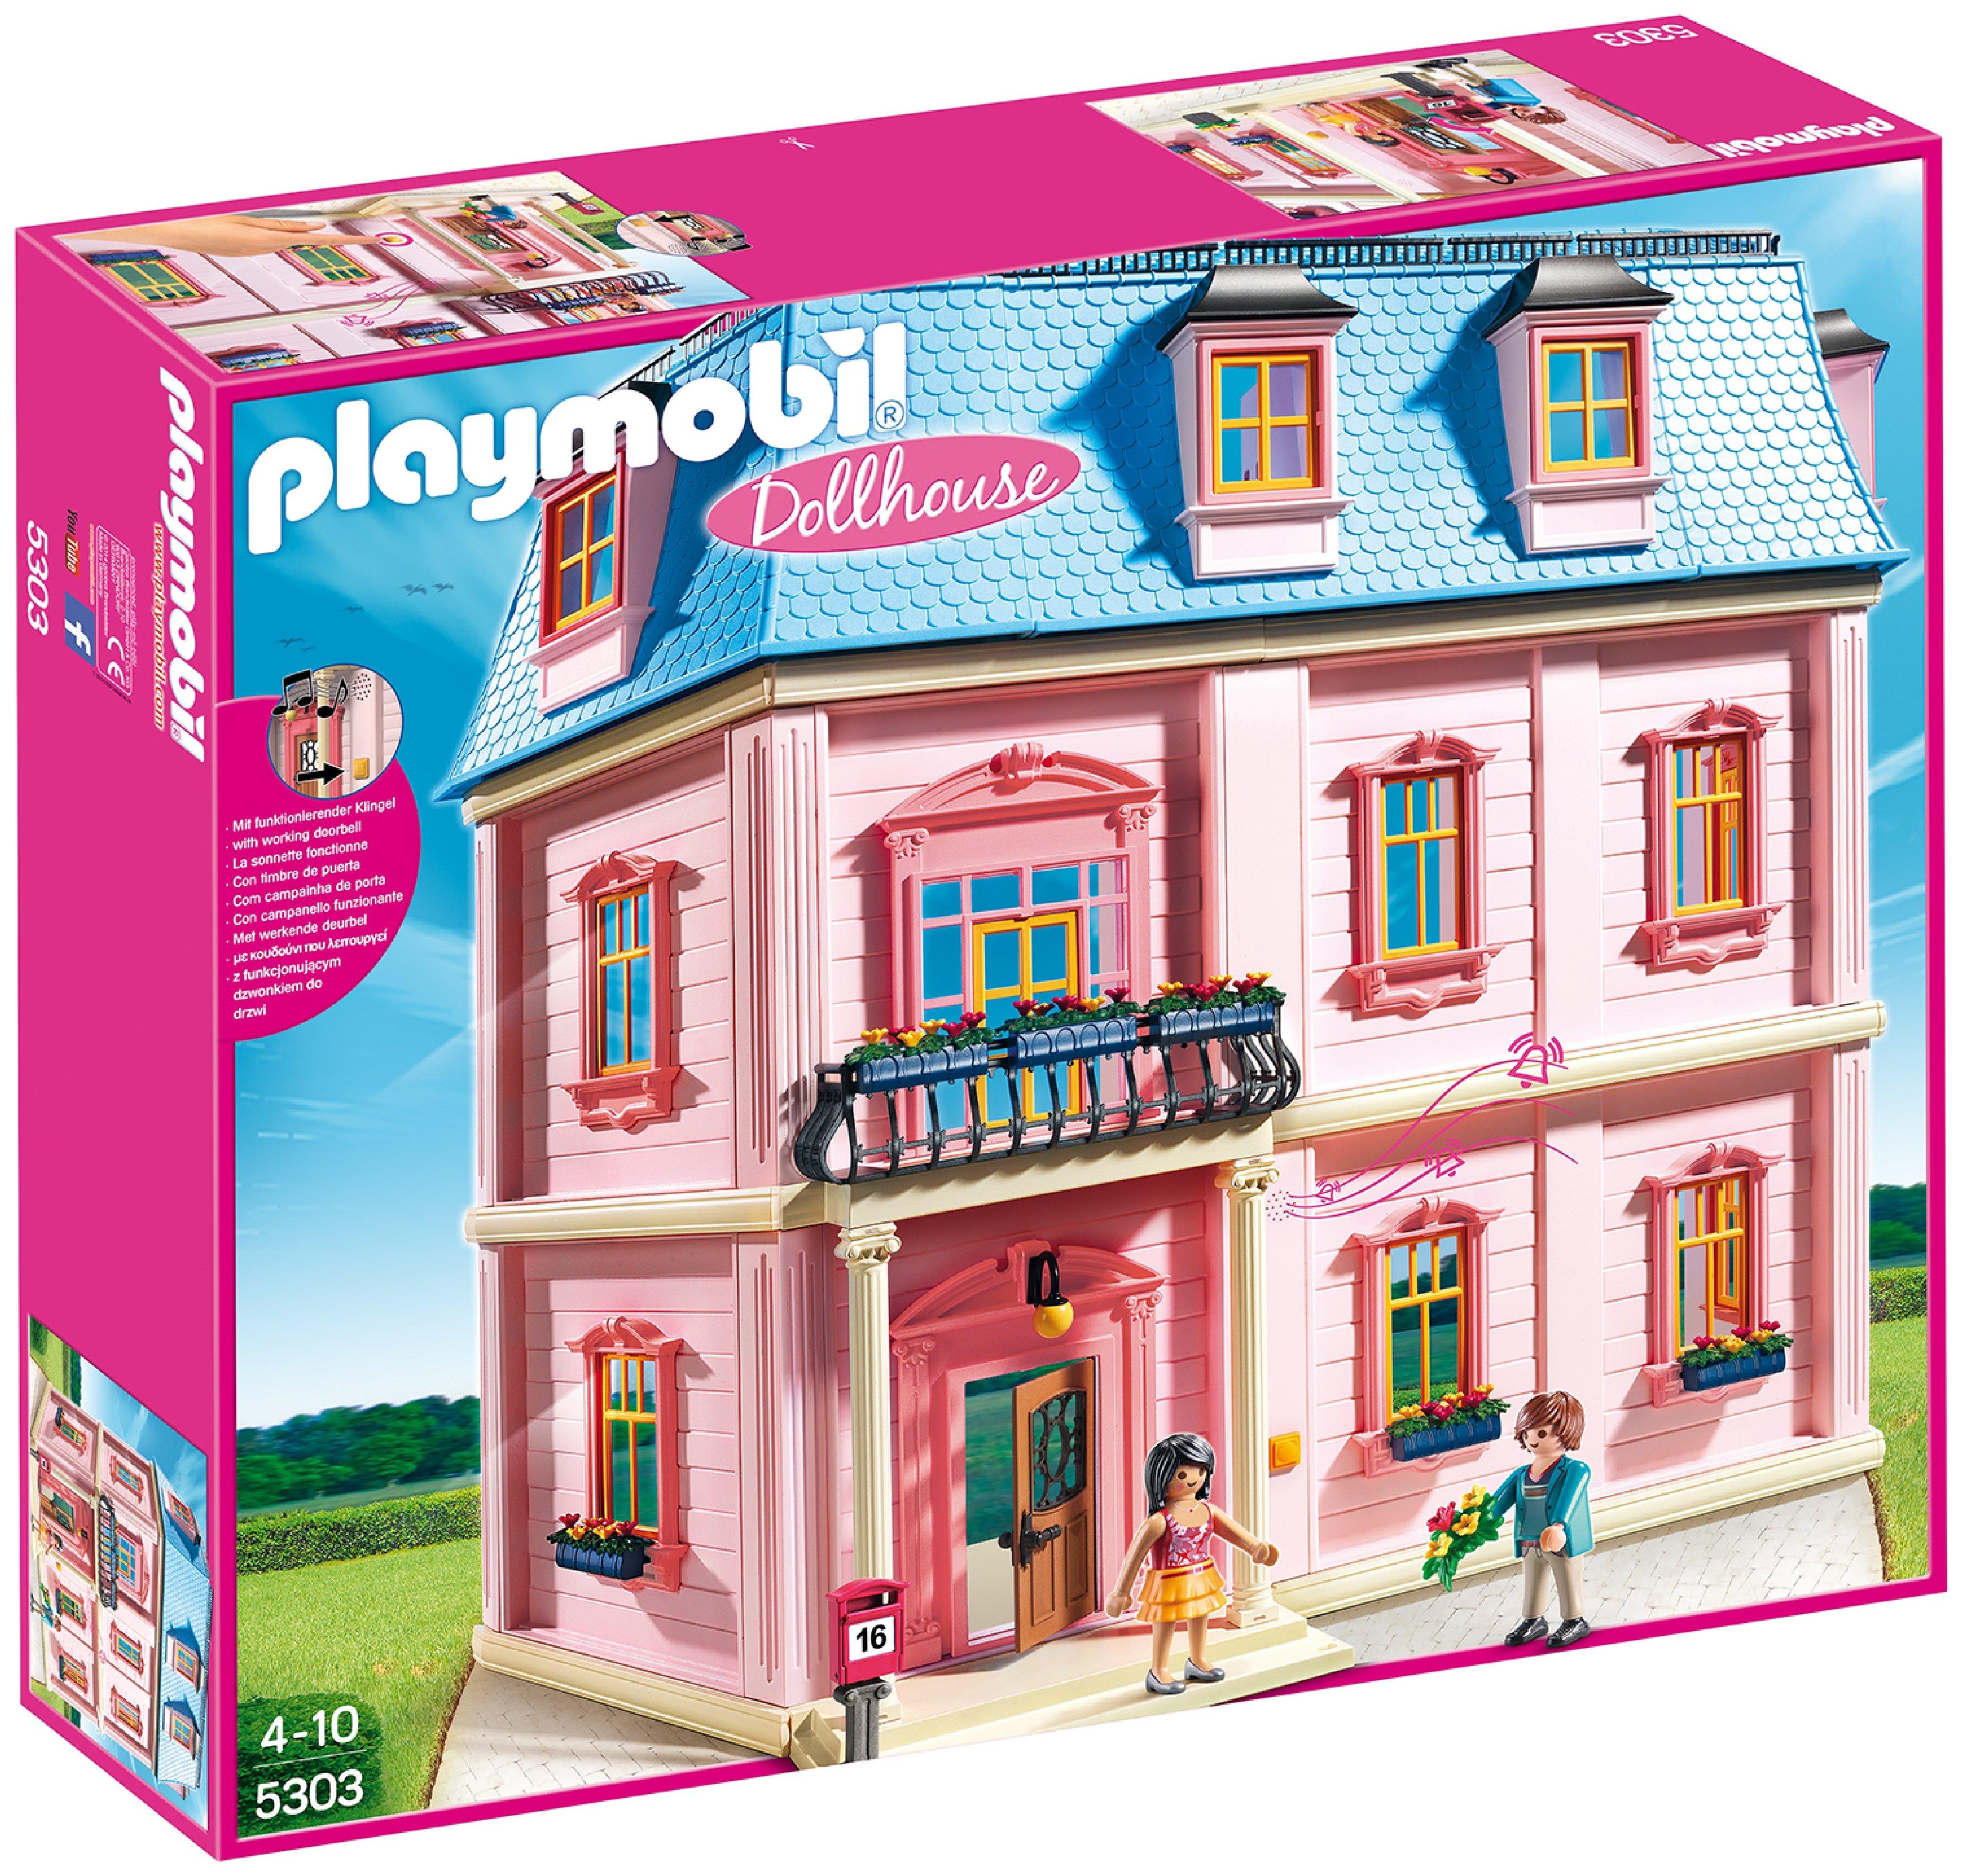 Playmobil 5303 Deluxe Dollhouse